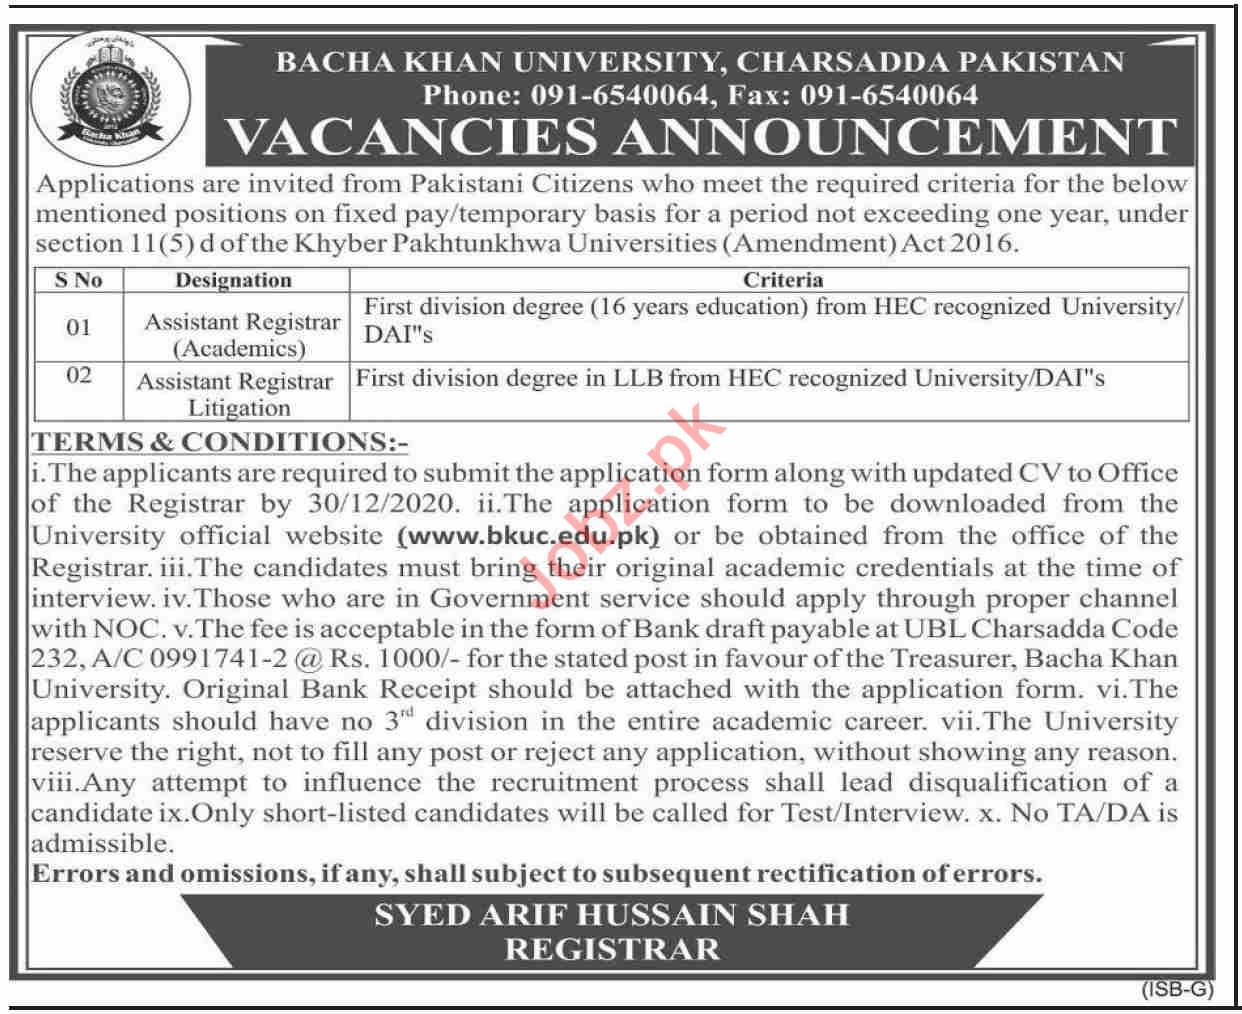 Bacha Khan University Charsadda BKUC Jobs 2021 for Registrar